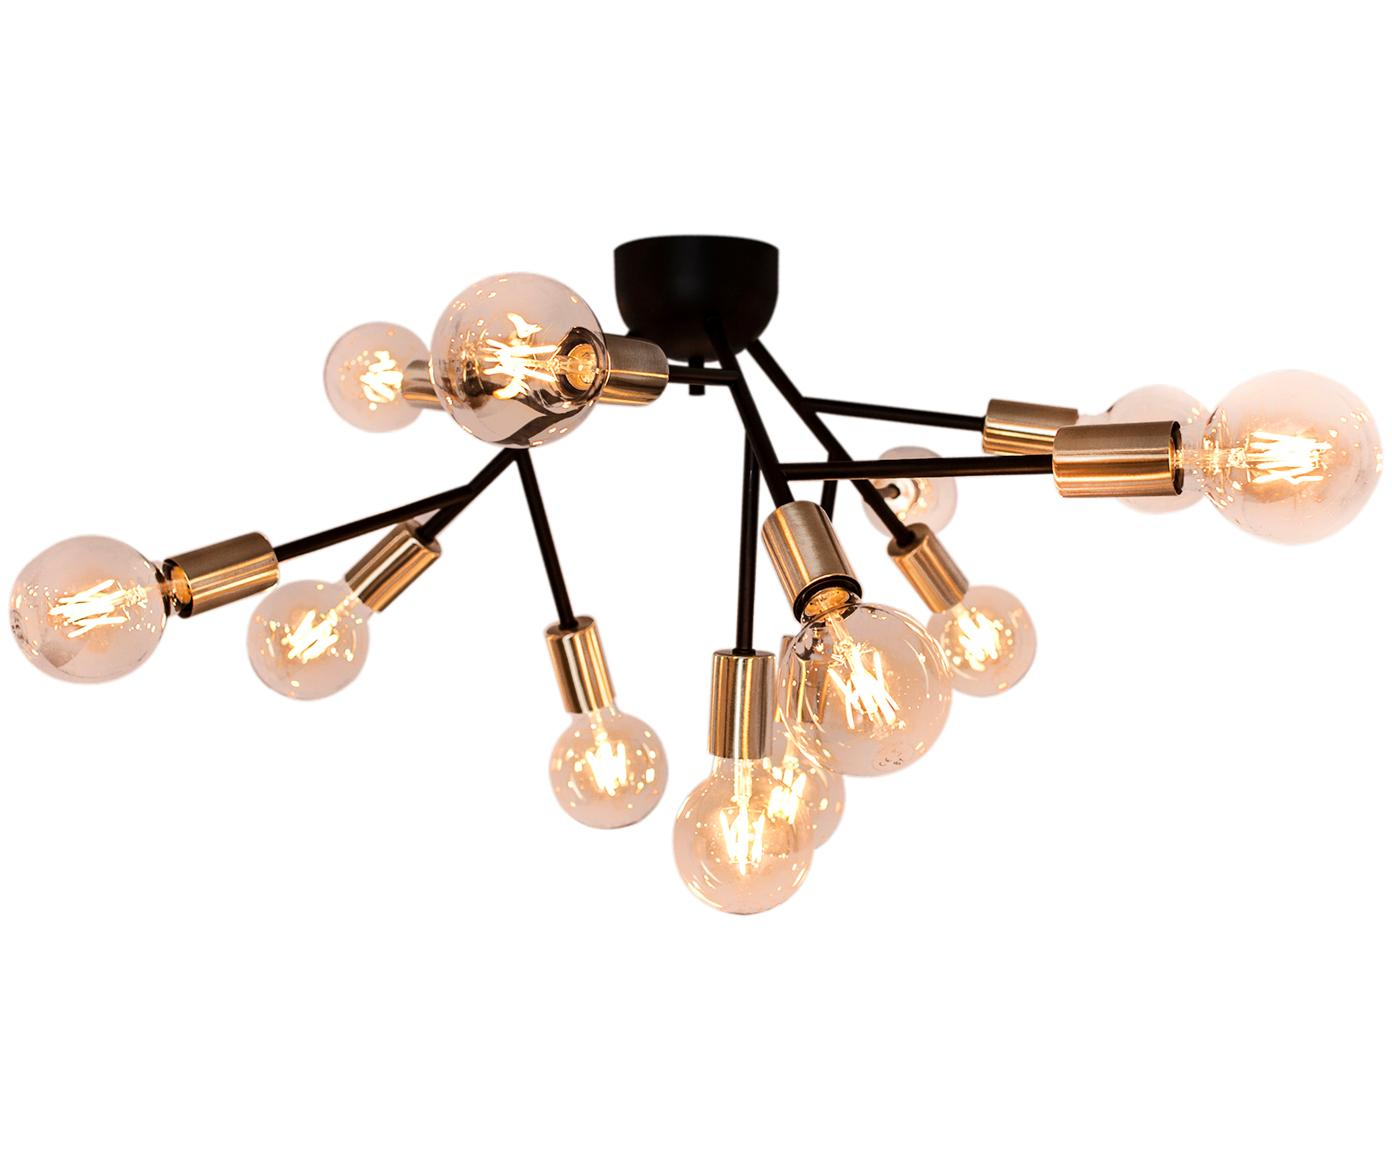 Moderne plafondlamp Hero, Zwart, messingkleurig, Ø 72 x H 28 cm